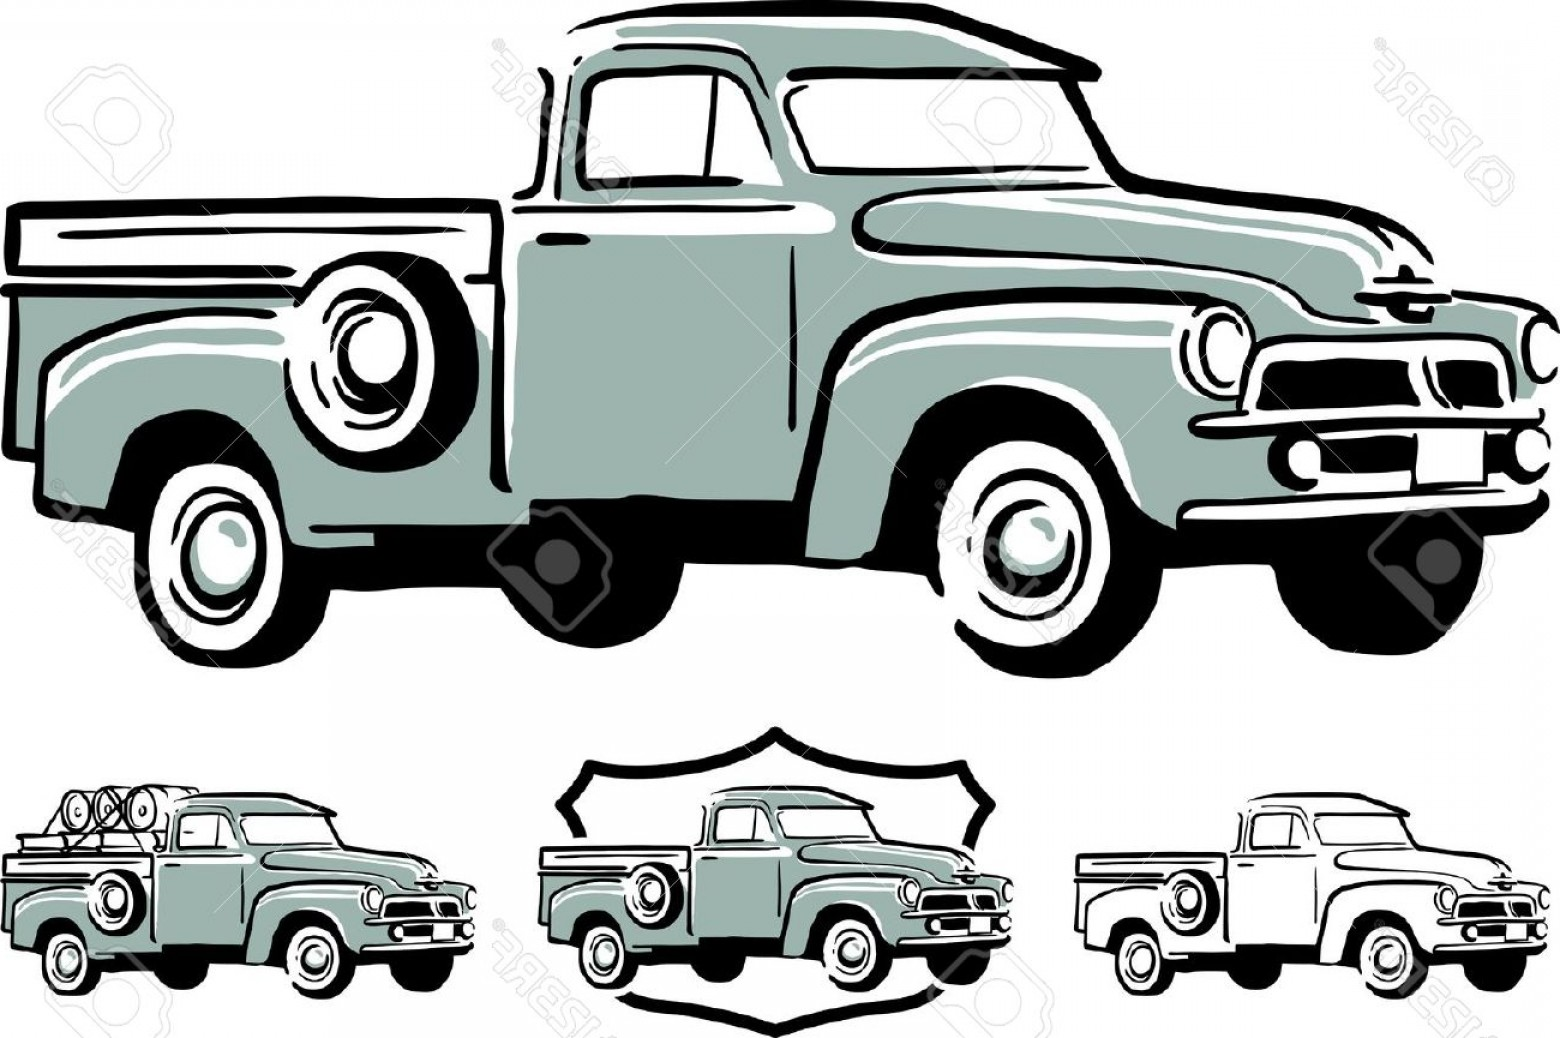 Vintage delivery truck clipart png black and white download Photoillustration Of Vintage Pick Up Truck | SOIDERGI png black and white download